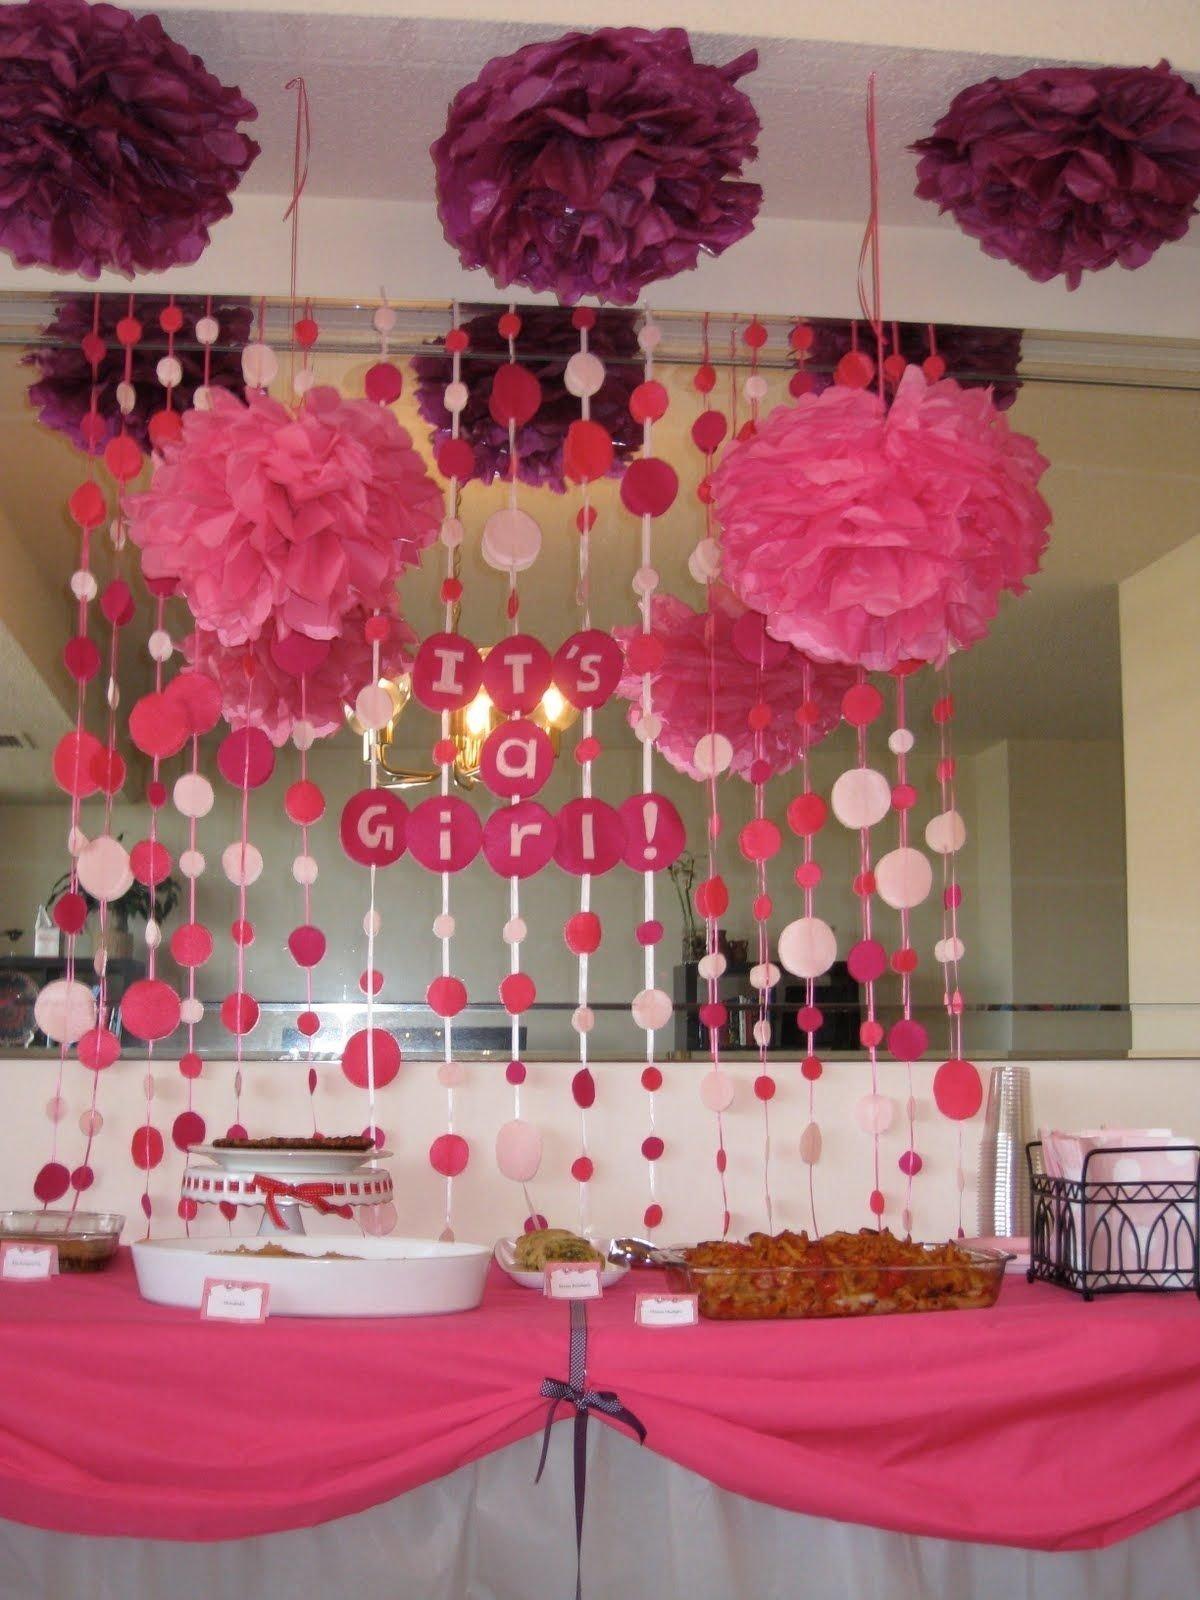 10 Stylish Centerpiece Ideas For Baby Shower For A Girl baby shower centerpiece ideas baby girl shower ideas wedding 2020